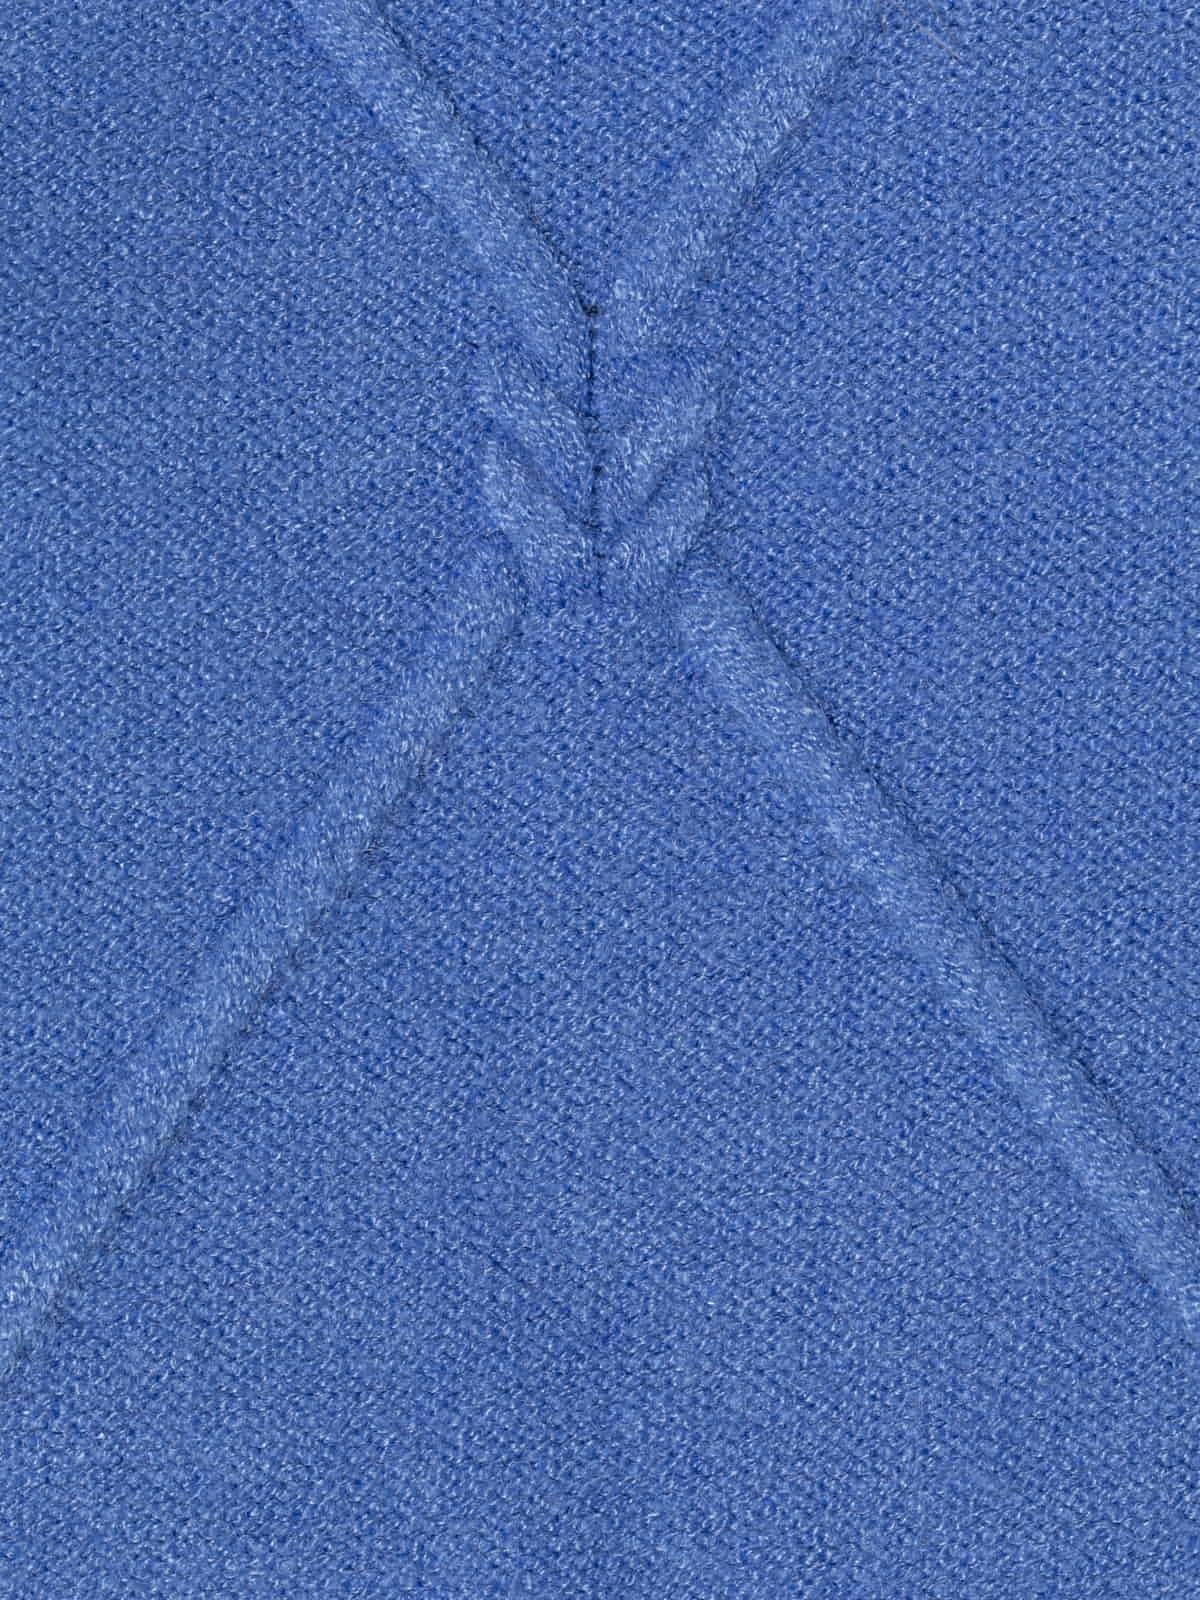 Jersey de punto rombos mujer Azul